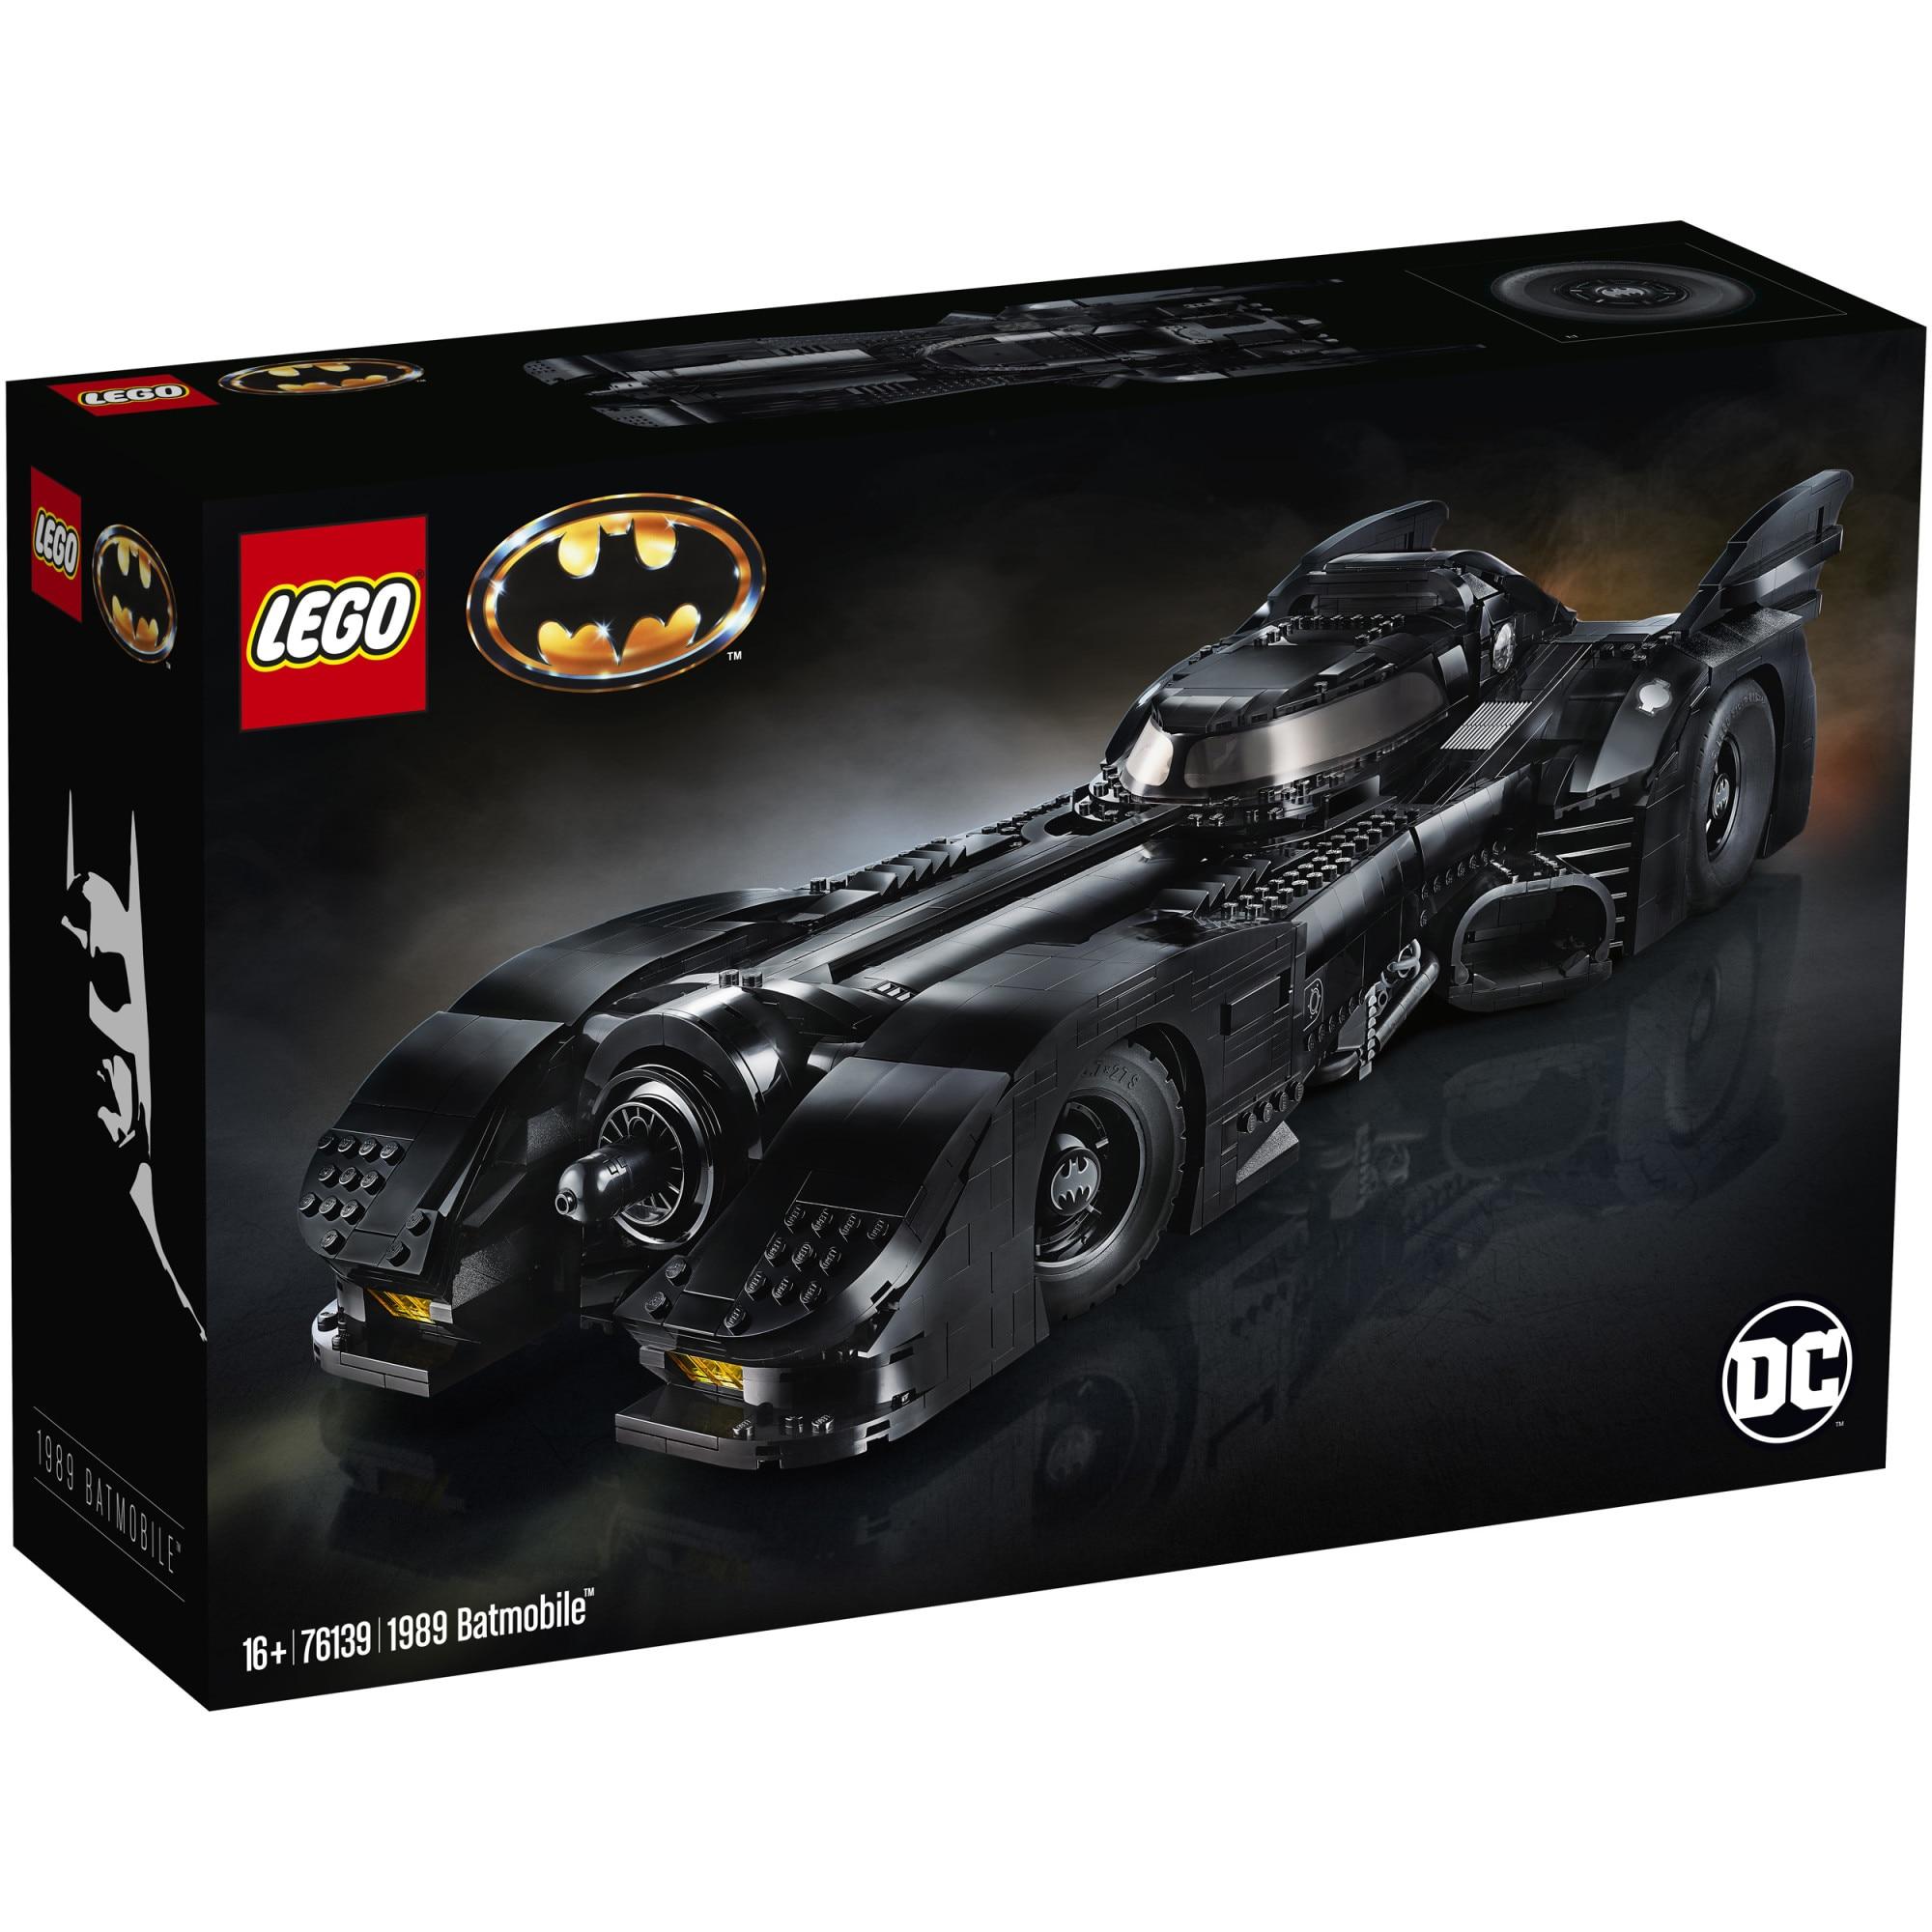 Fotografie LEGO Super Heroes - 1989 Batmobile 76139, 3308 piese